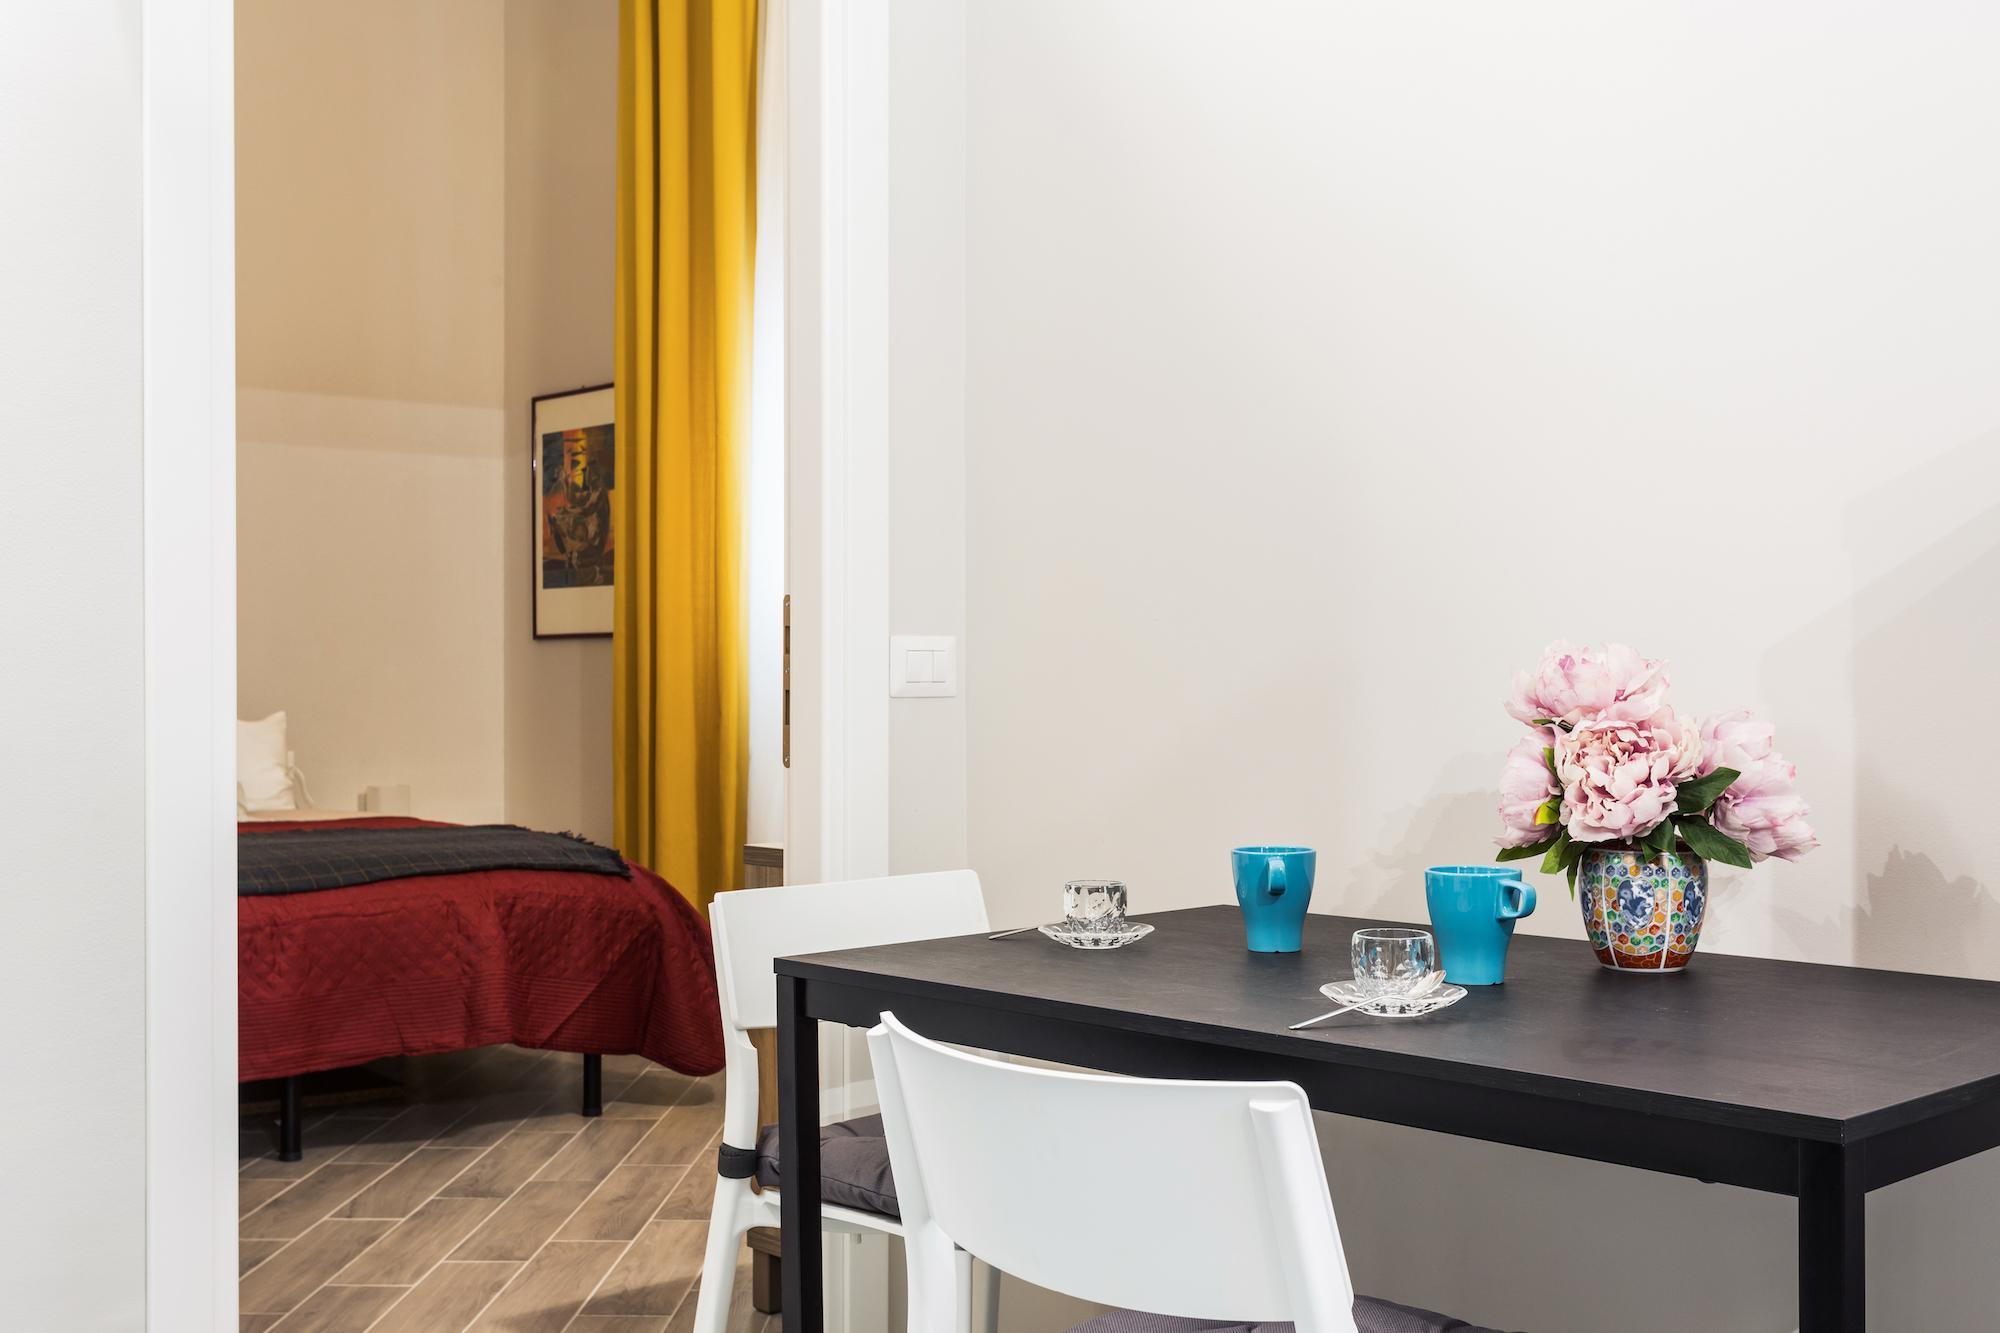 Cozy and warm 1 bedroom apartment - Sapeto pt1